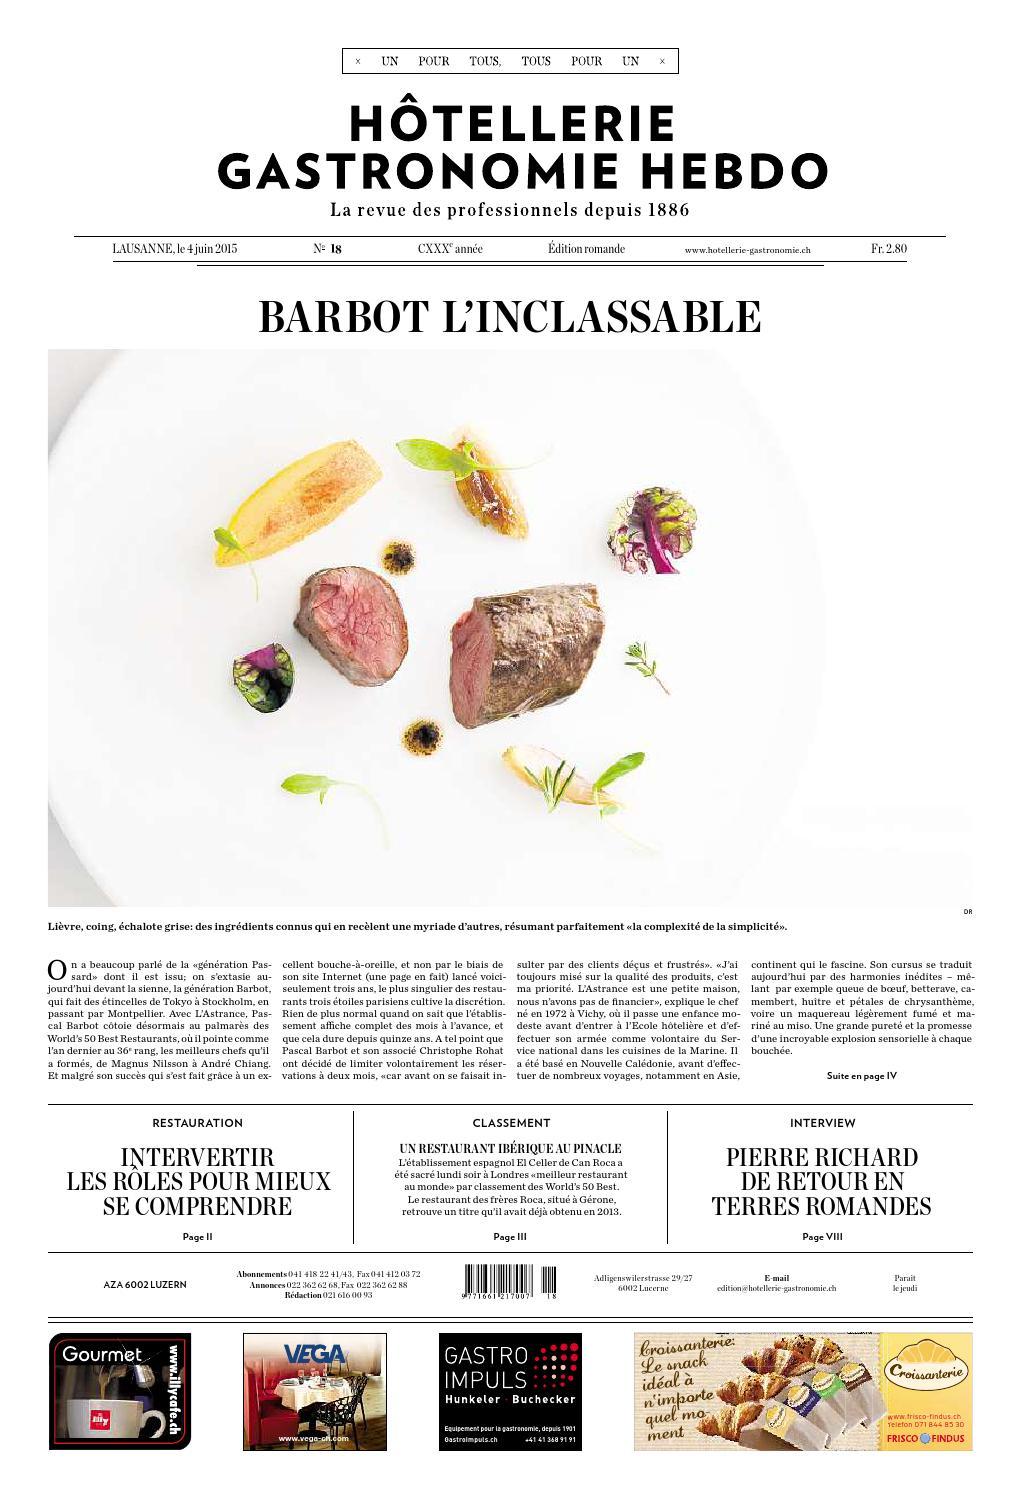 HG Hebdo 18 2015 By Hotellerie Gastronomie Verlag